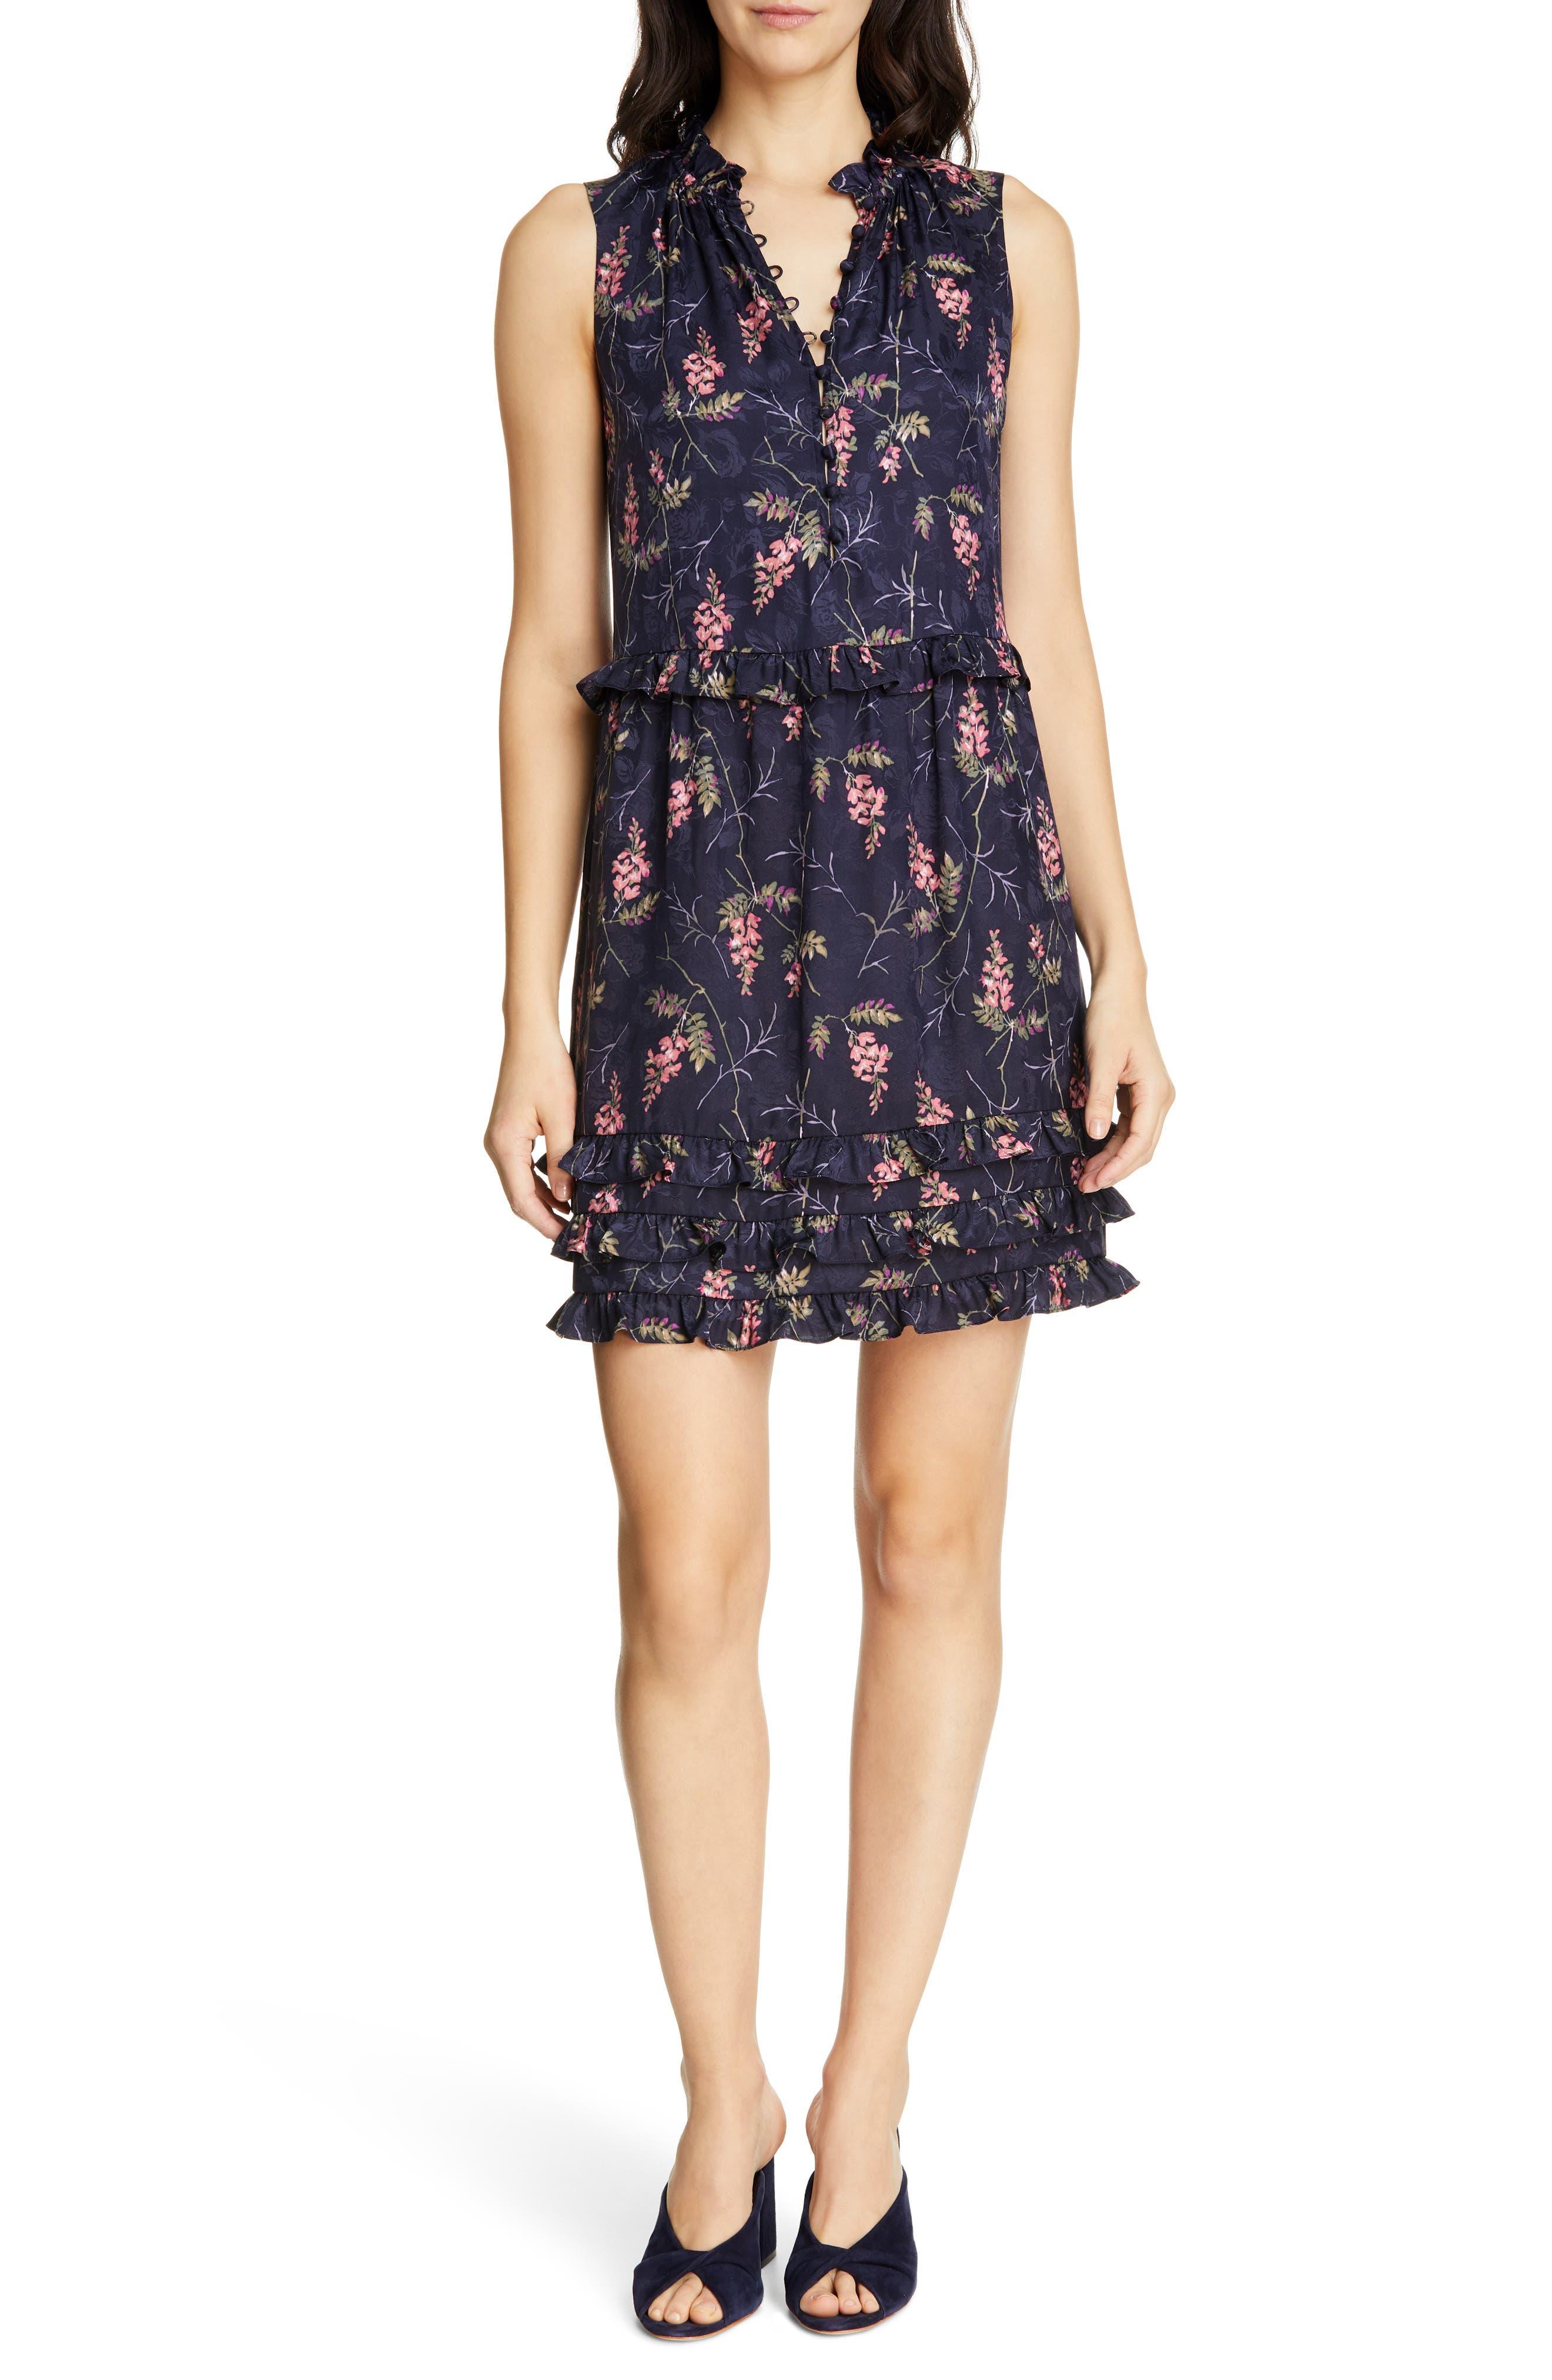 REBECCA TAYLOR, Ivie Floral Ruffle Silk Blend Dress, Main thumbnail 1, color, NAVY COMBO